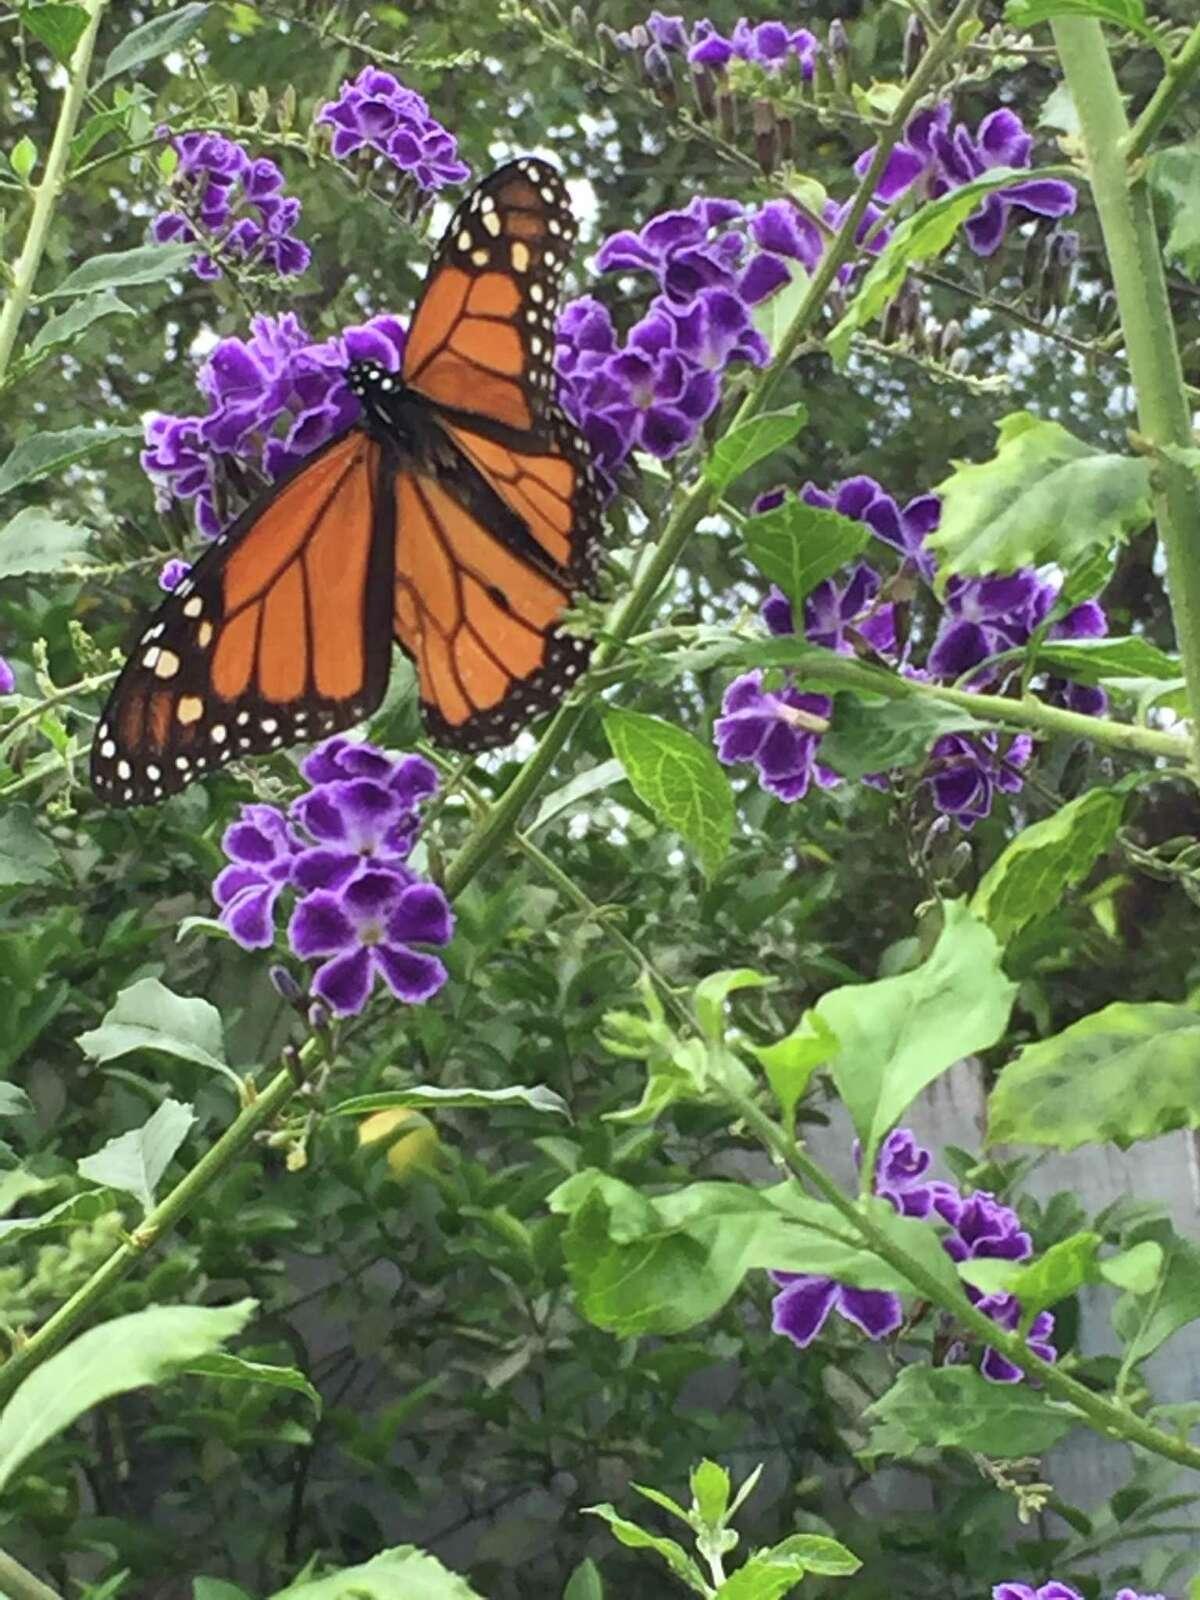 Duranta is popular with butterflies.